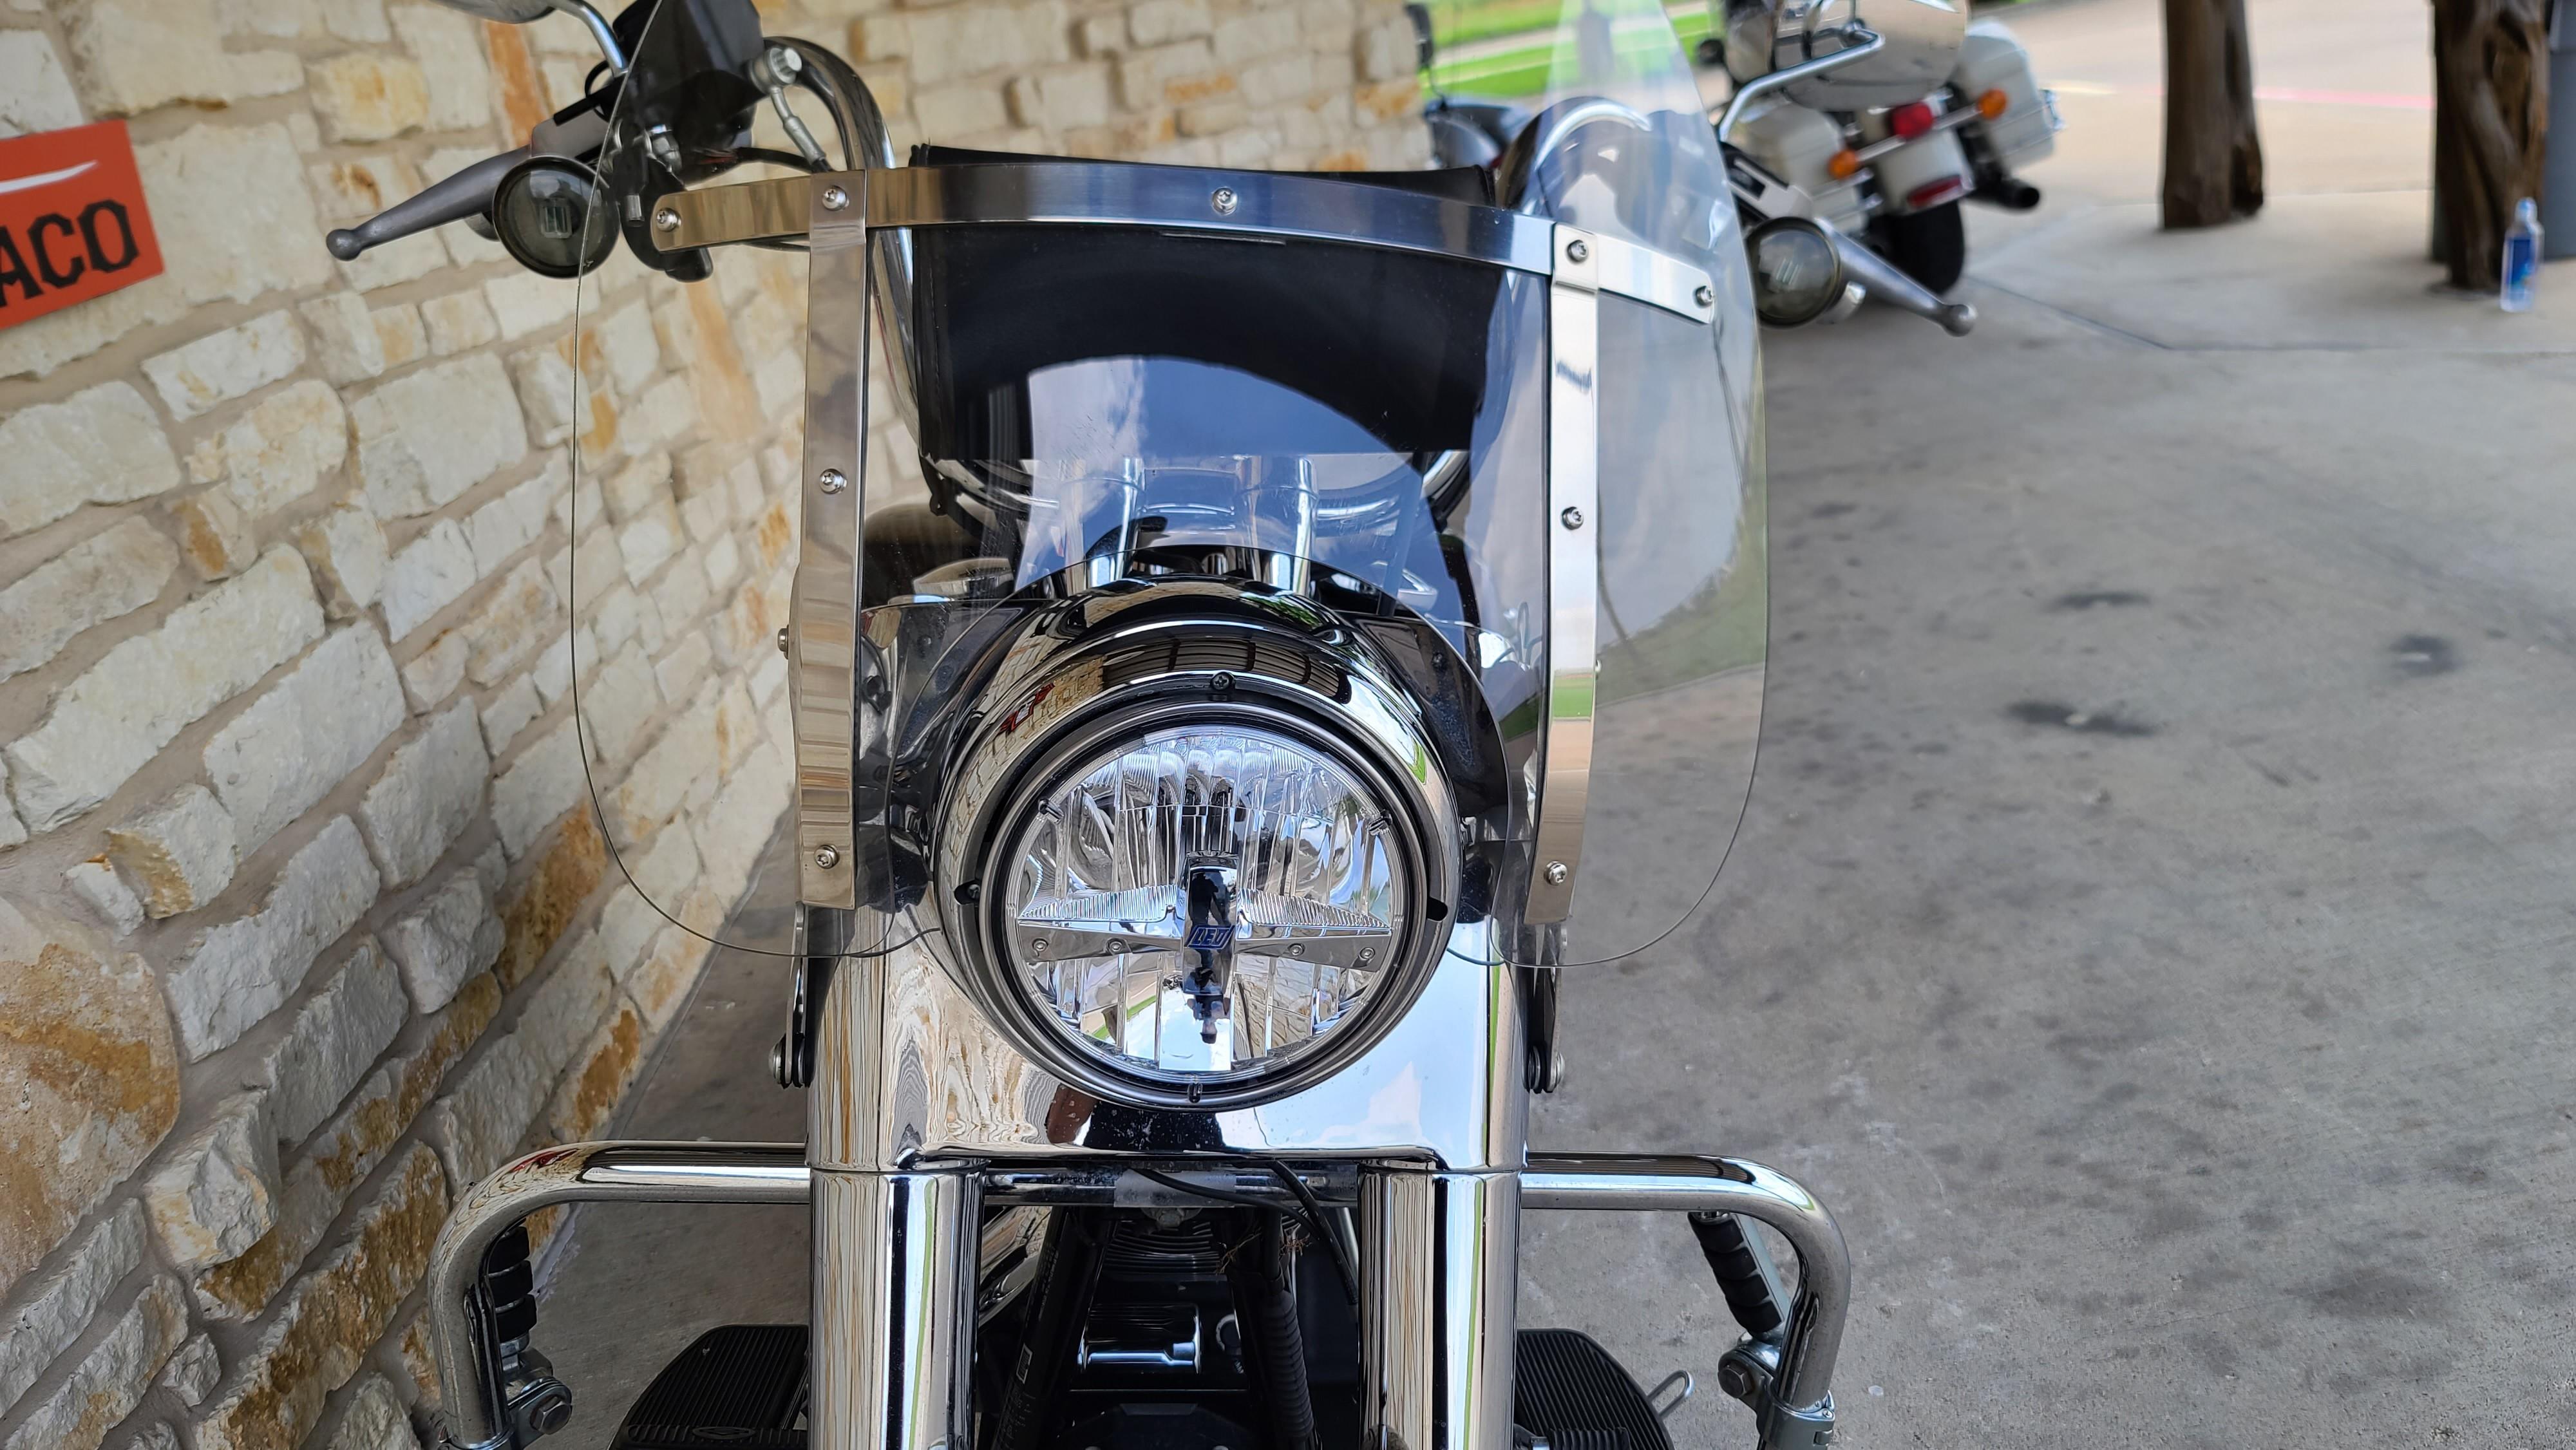 2014 Harley-Davidson Dyna Switchback at Harley-Davidson of Waco